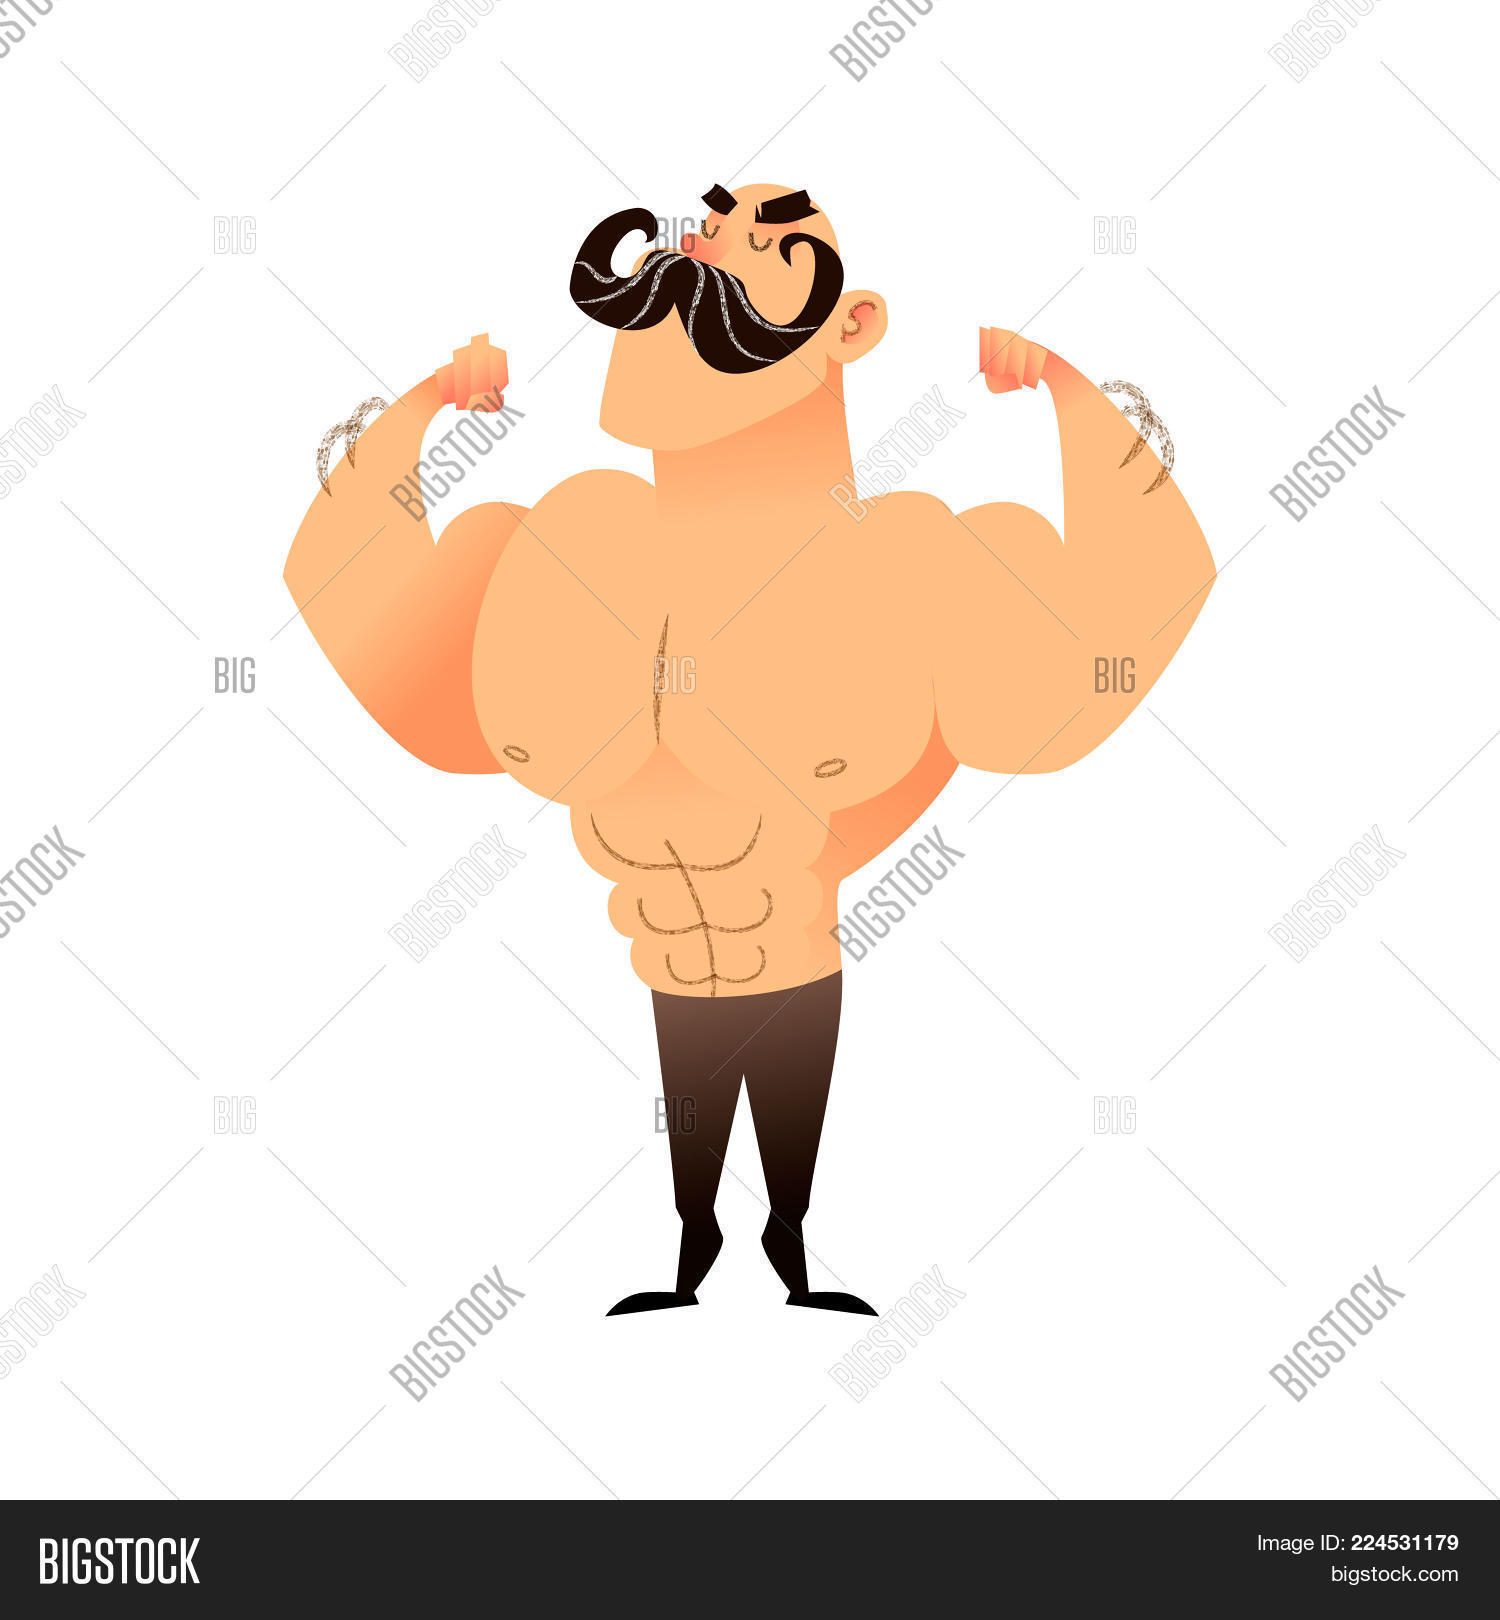 Cartoon Muscular Man Image & Photo (Free Trial) | Bigstock